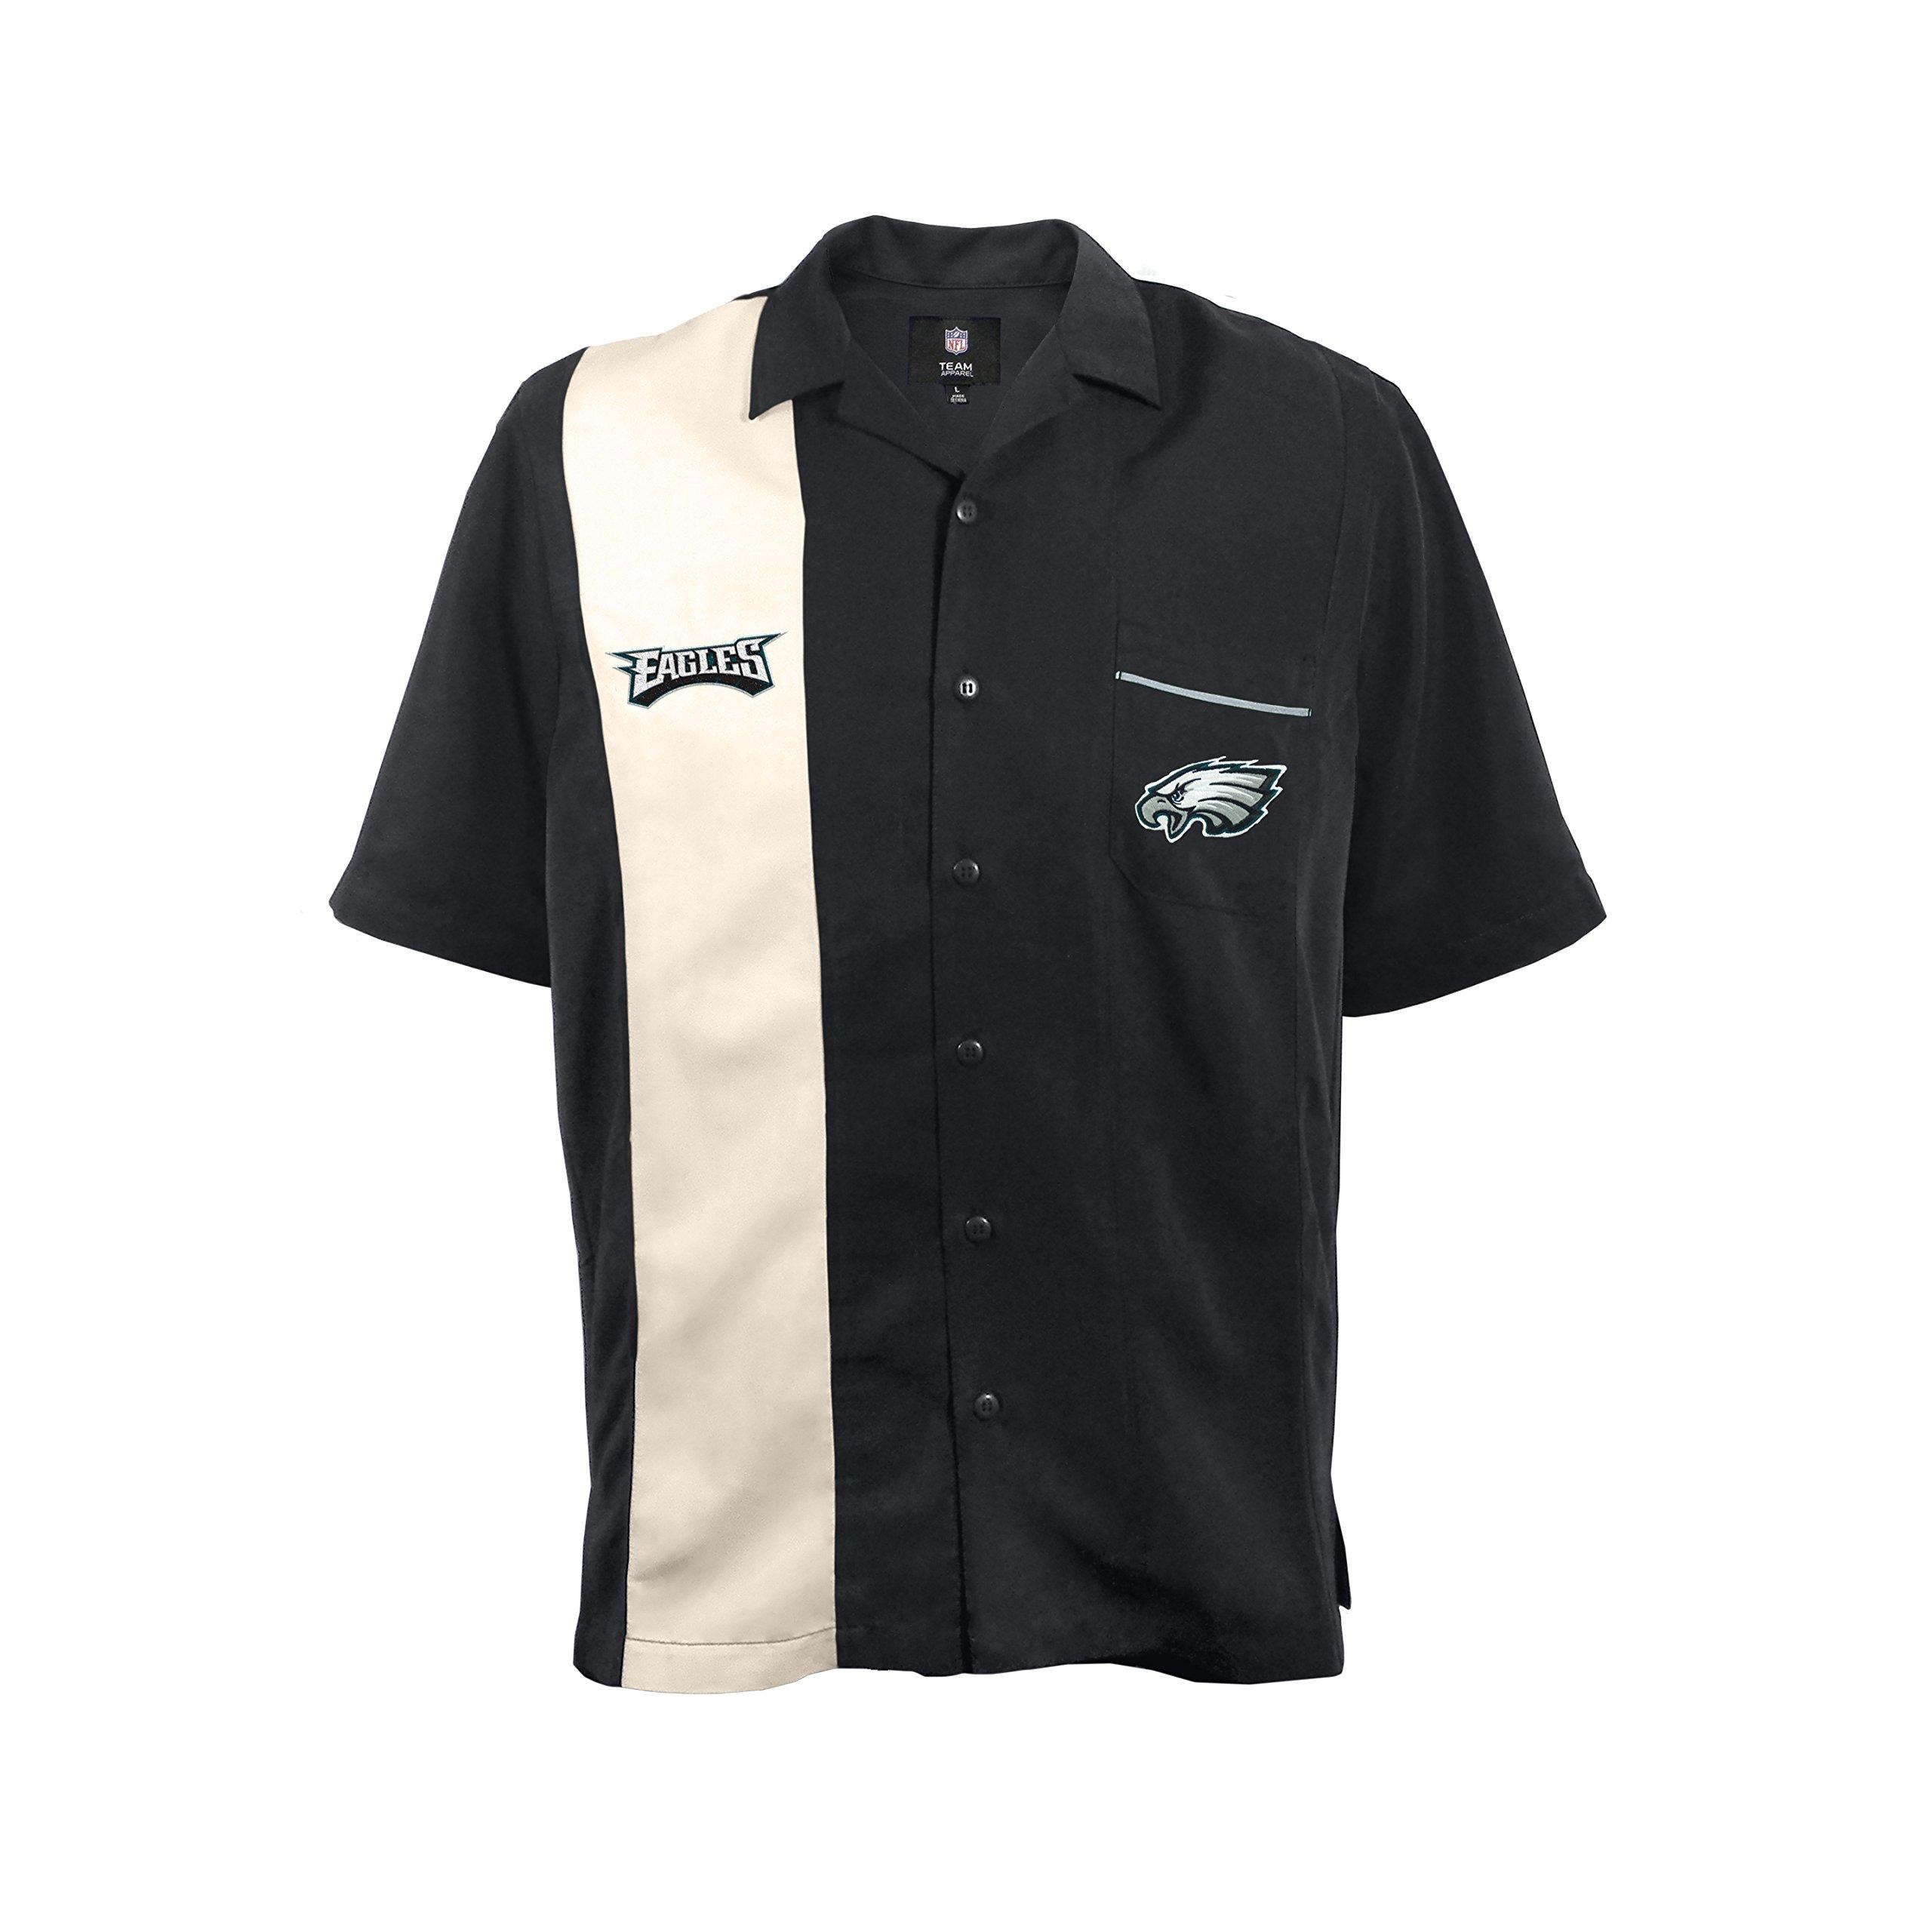 NFL Philadelphia Eagles Strike Bowling Shirt, XL by Littlearth